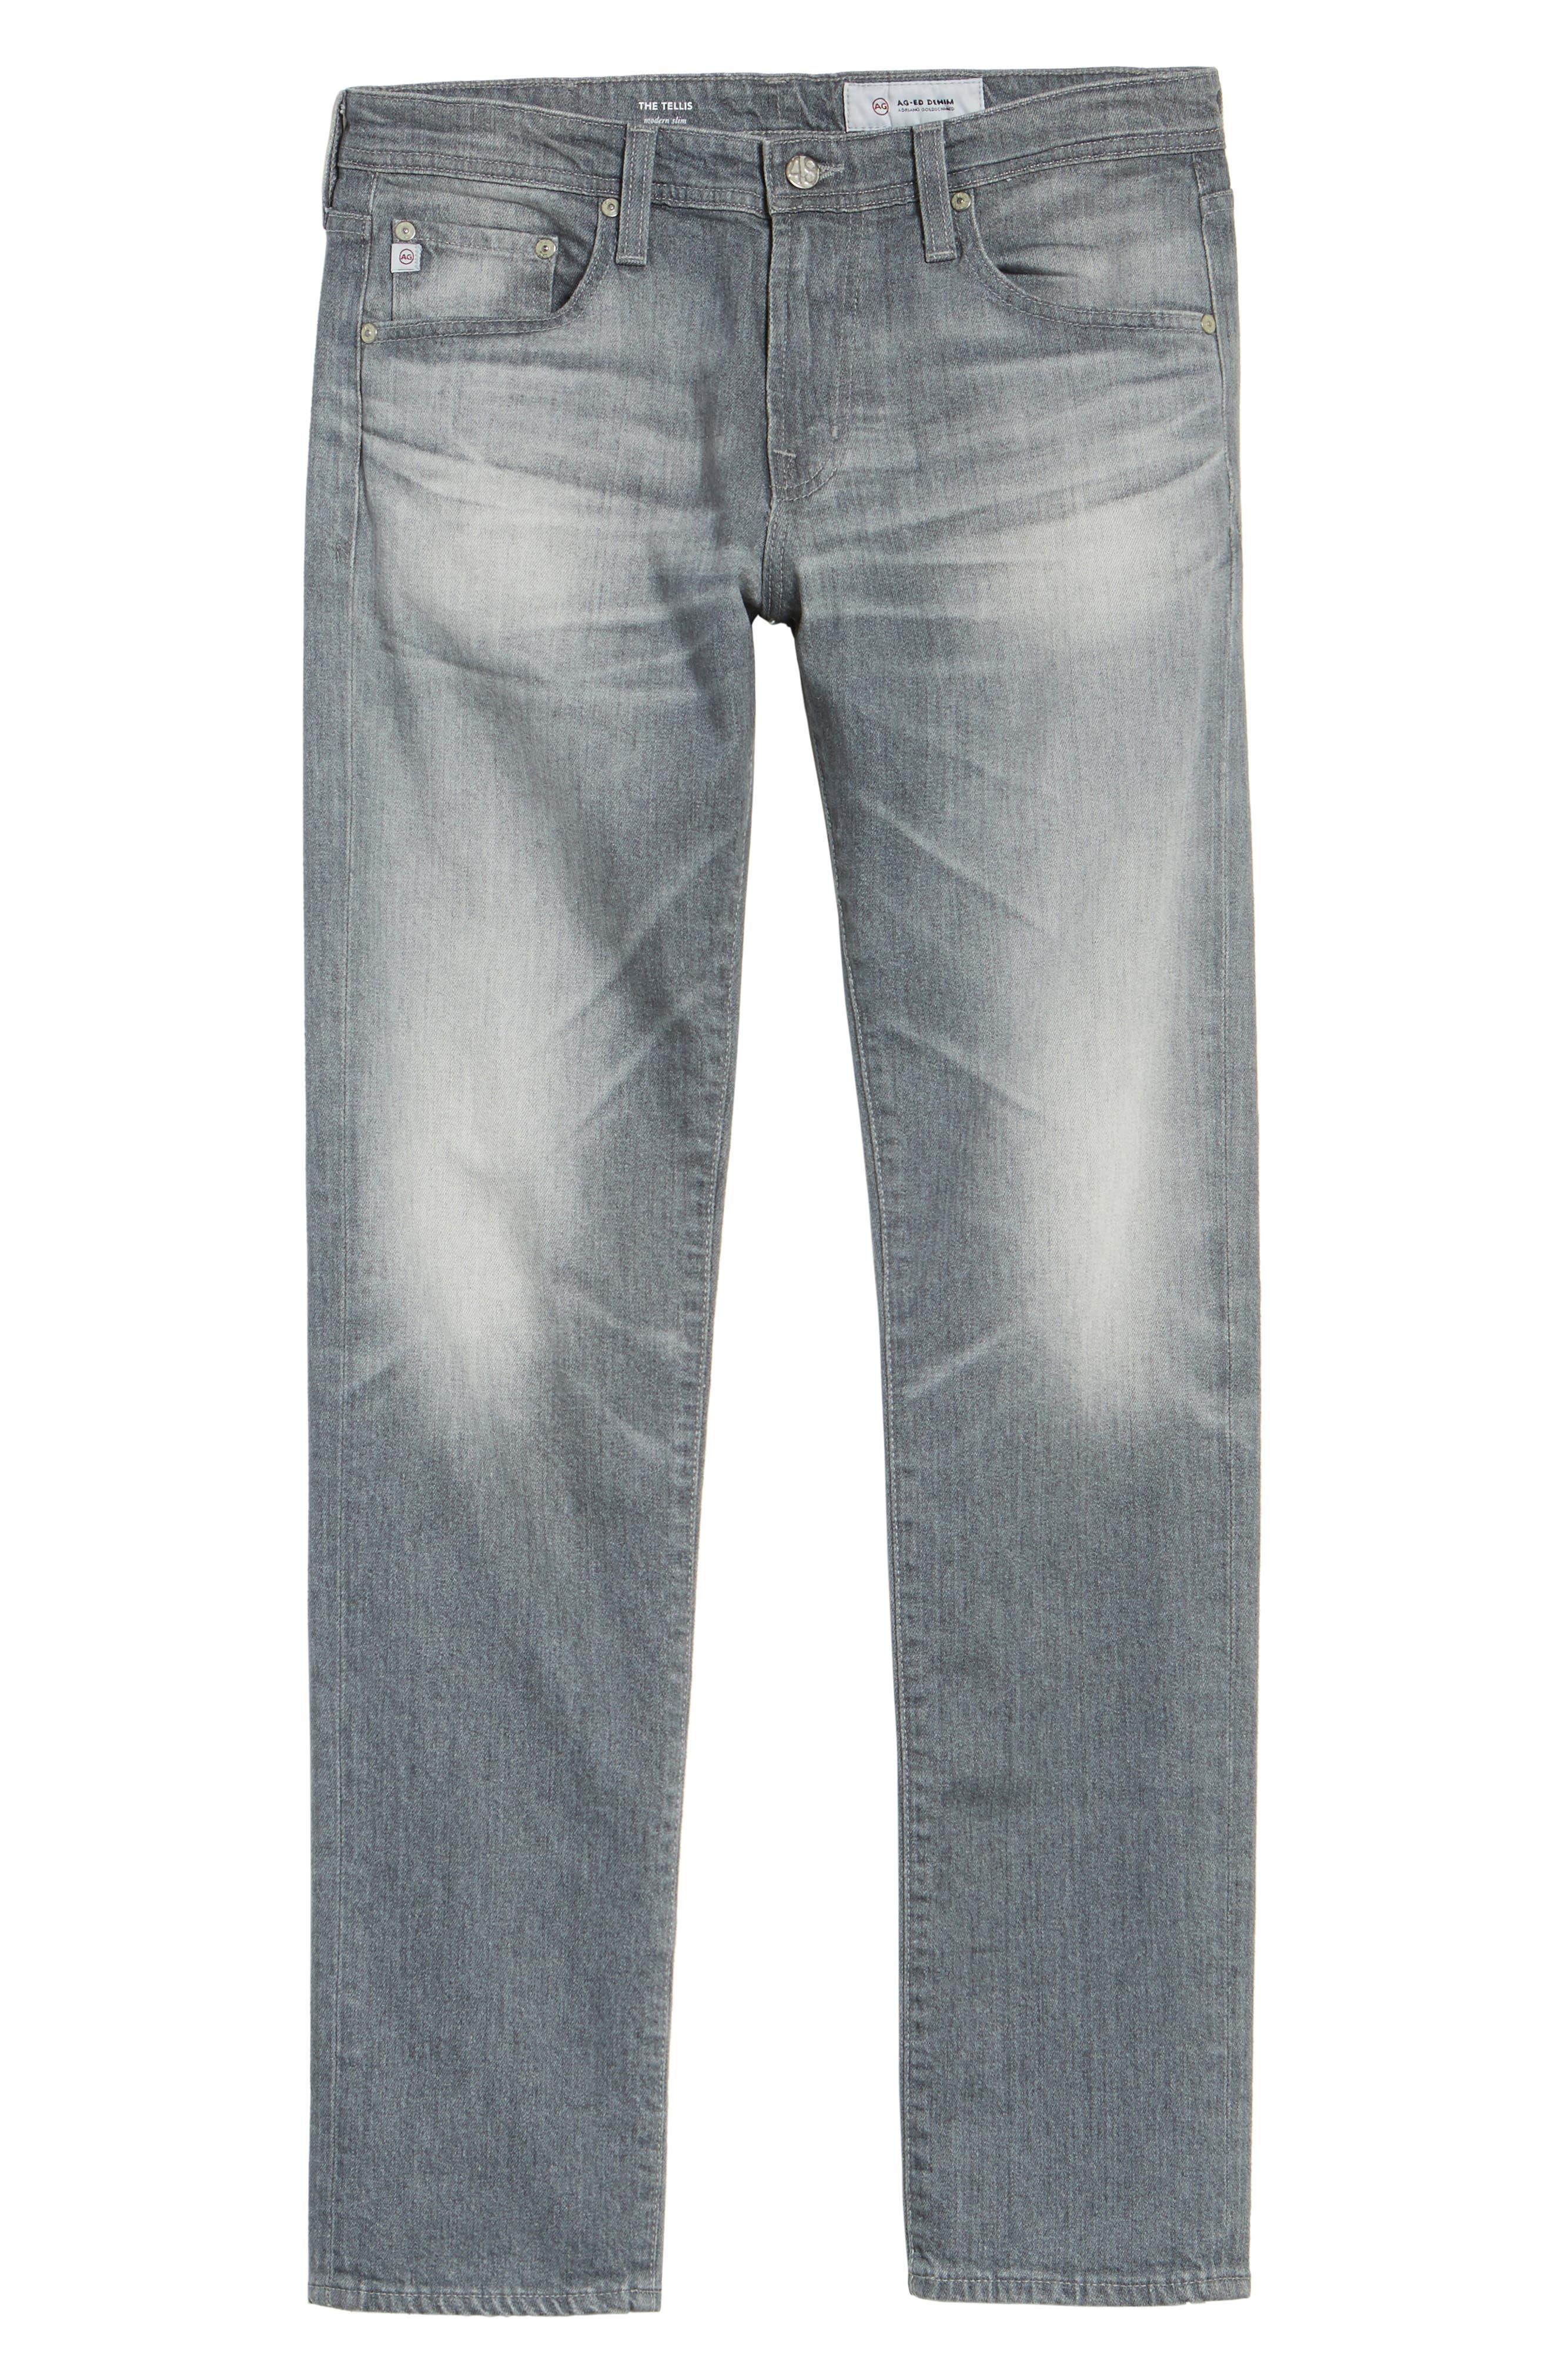 Tellis Modern Slim Fit Jeans,                             Alternate thumbnail 6, color,                             020